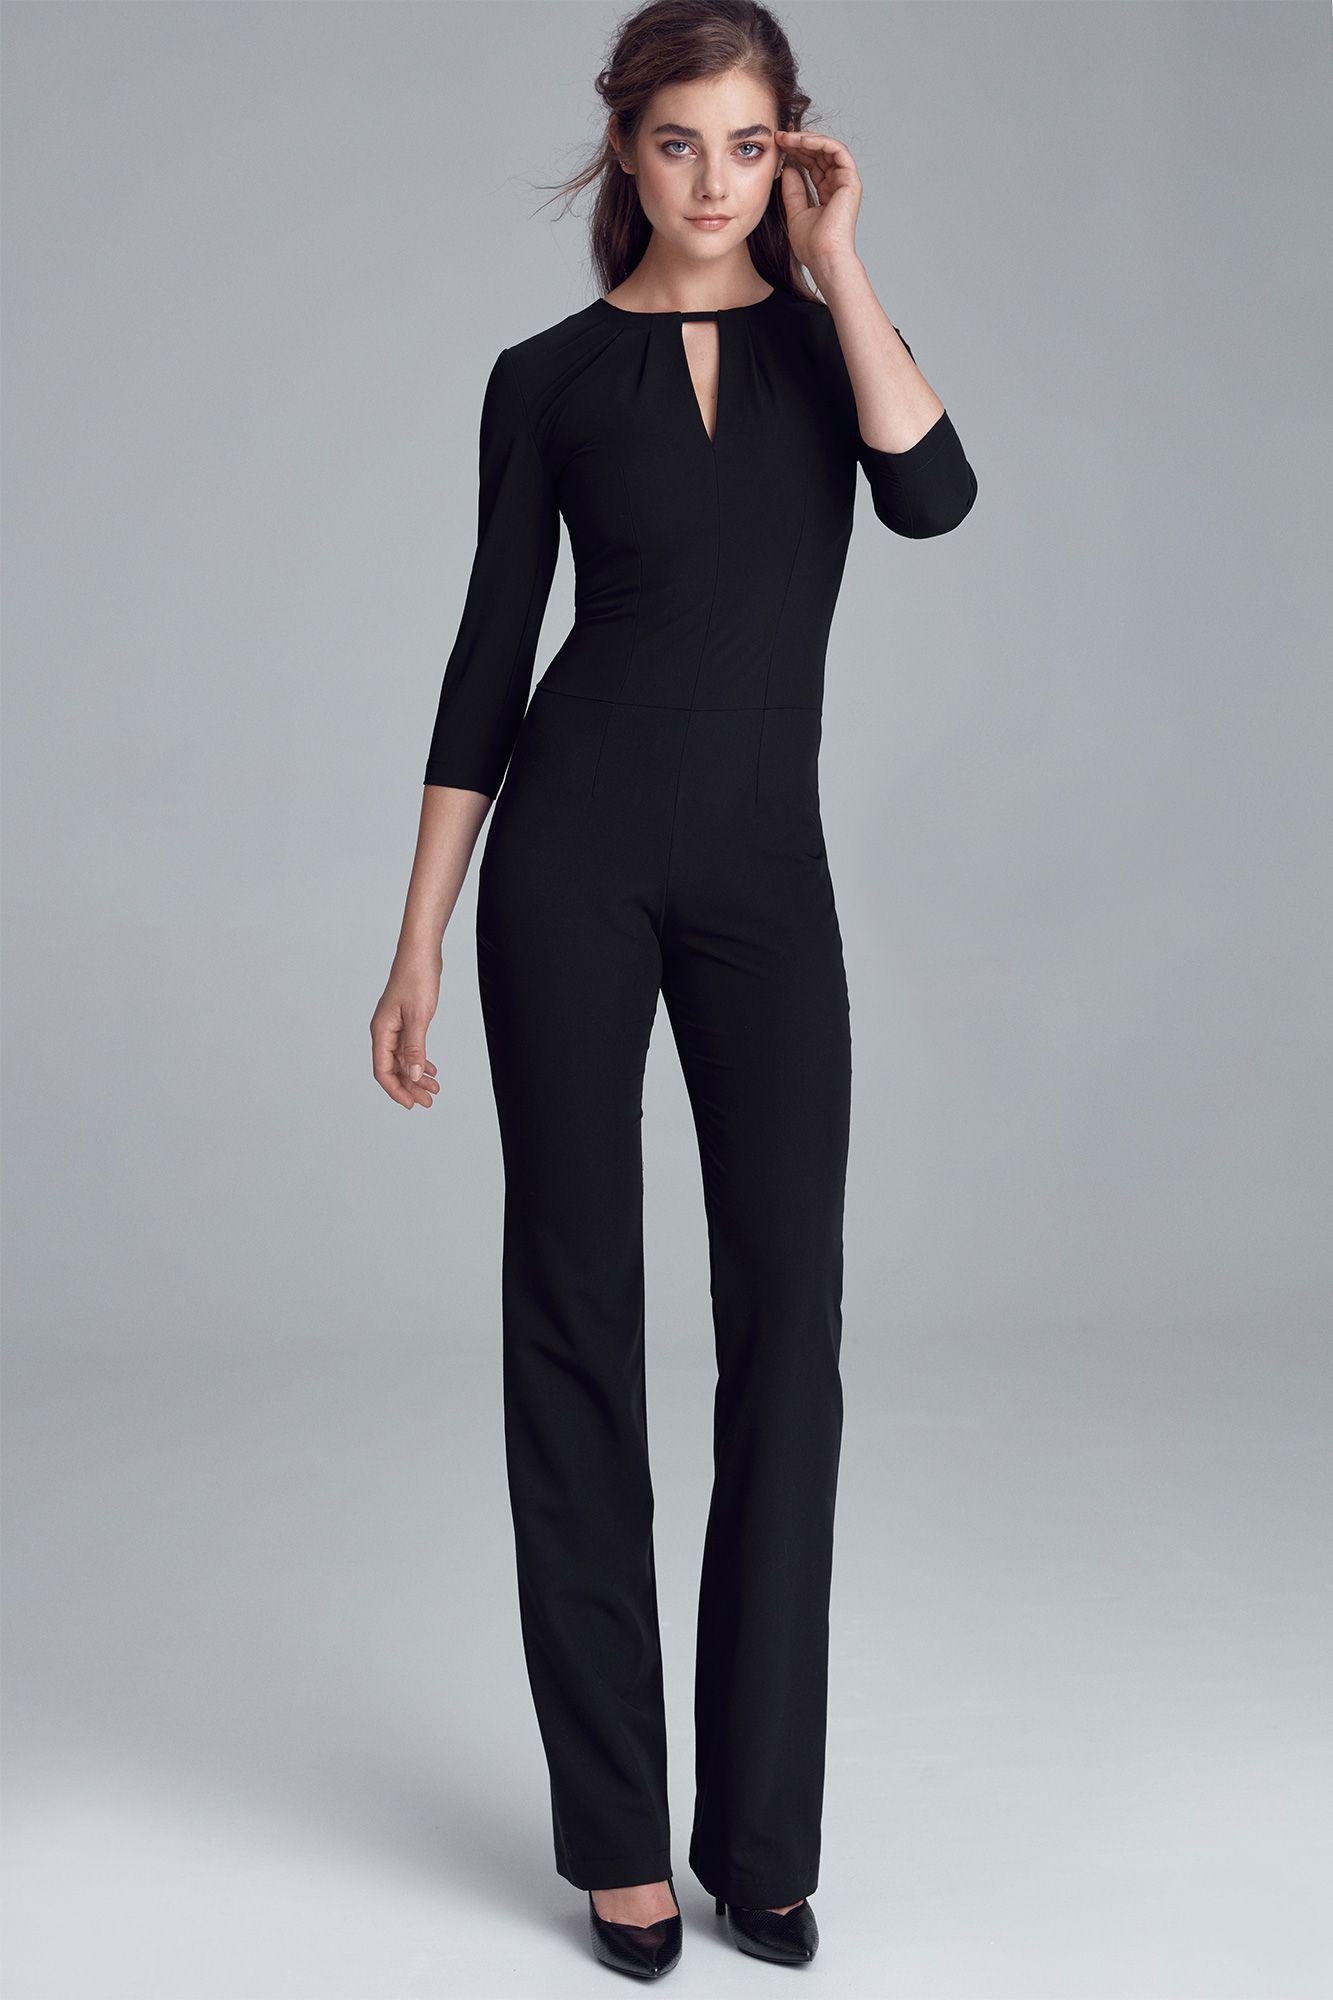 Jumpsuit with crack on the neckline - black